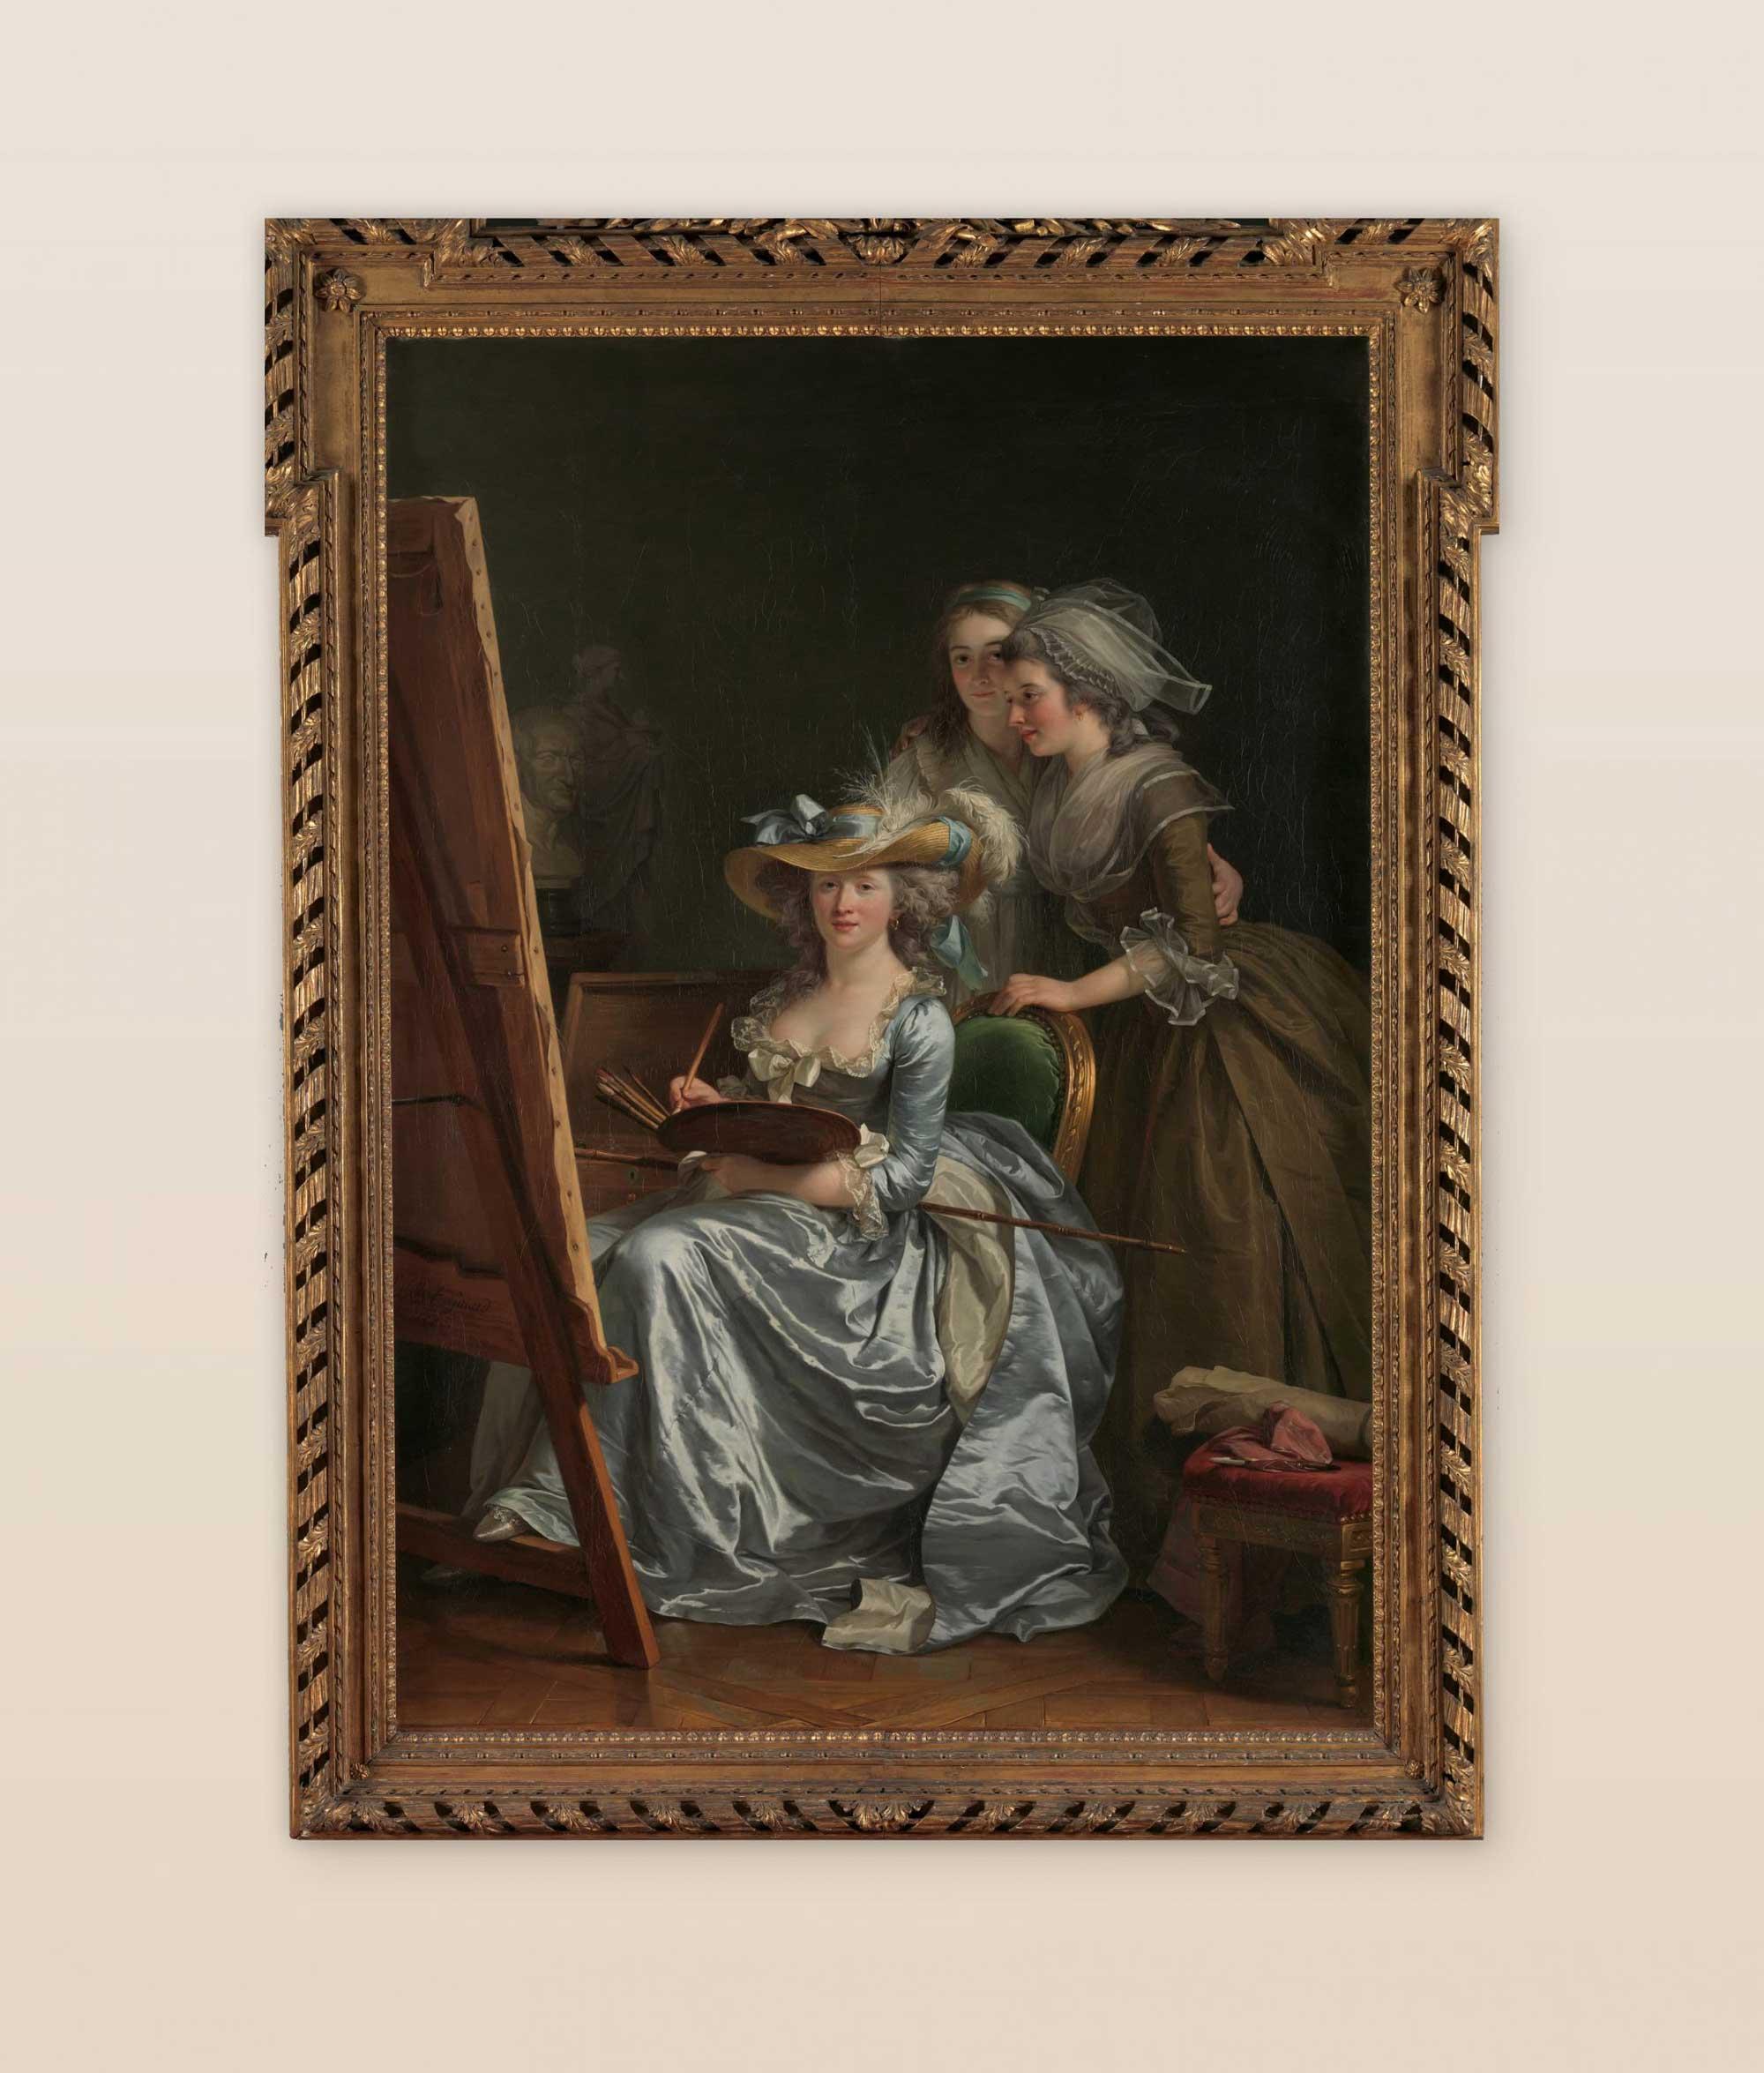 """Self-Portrait with Two Pupils, Marie Gabrielle Capet and Marie Marguerite Carreaux de Rosemond"" by Adélaïde Labille-Guiard, hung up on a gallery wall."